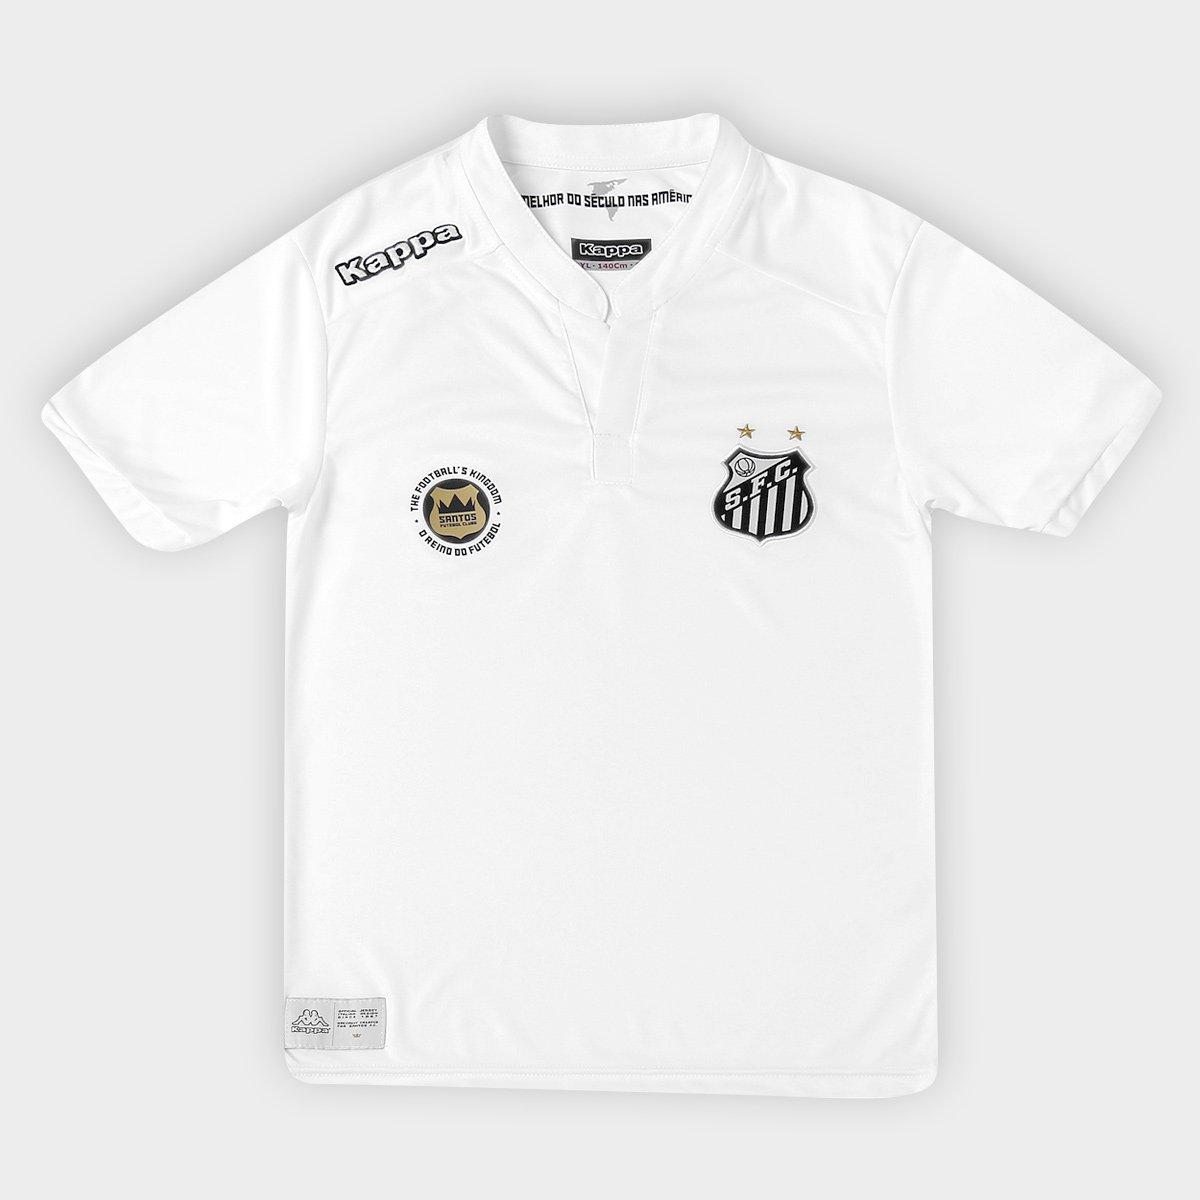 81112cb916 Camisa Santos Infantil I 2016 s nº Torcedor Kappa - Compre Agora ...